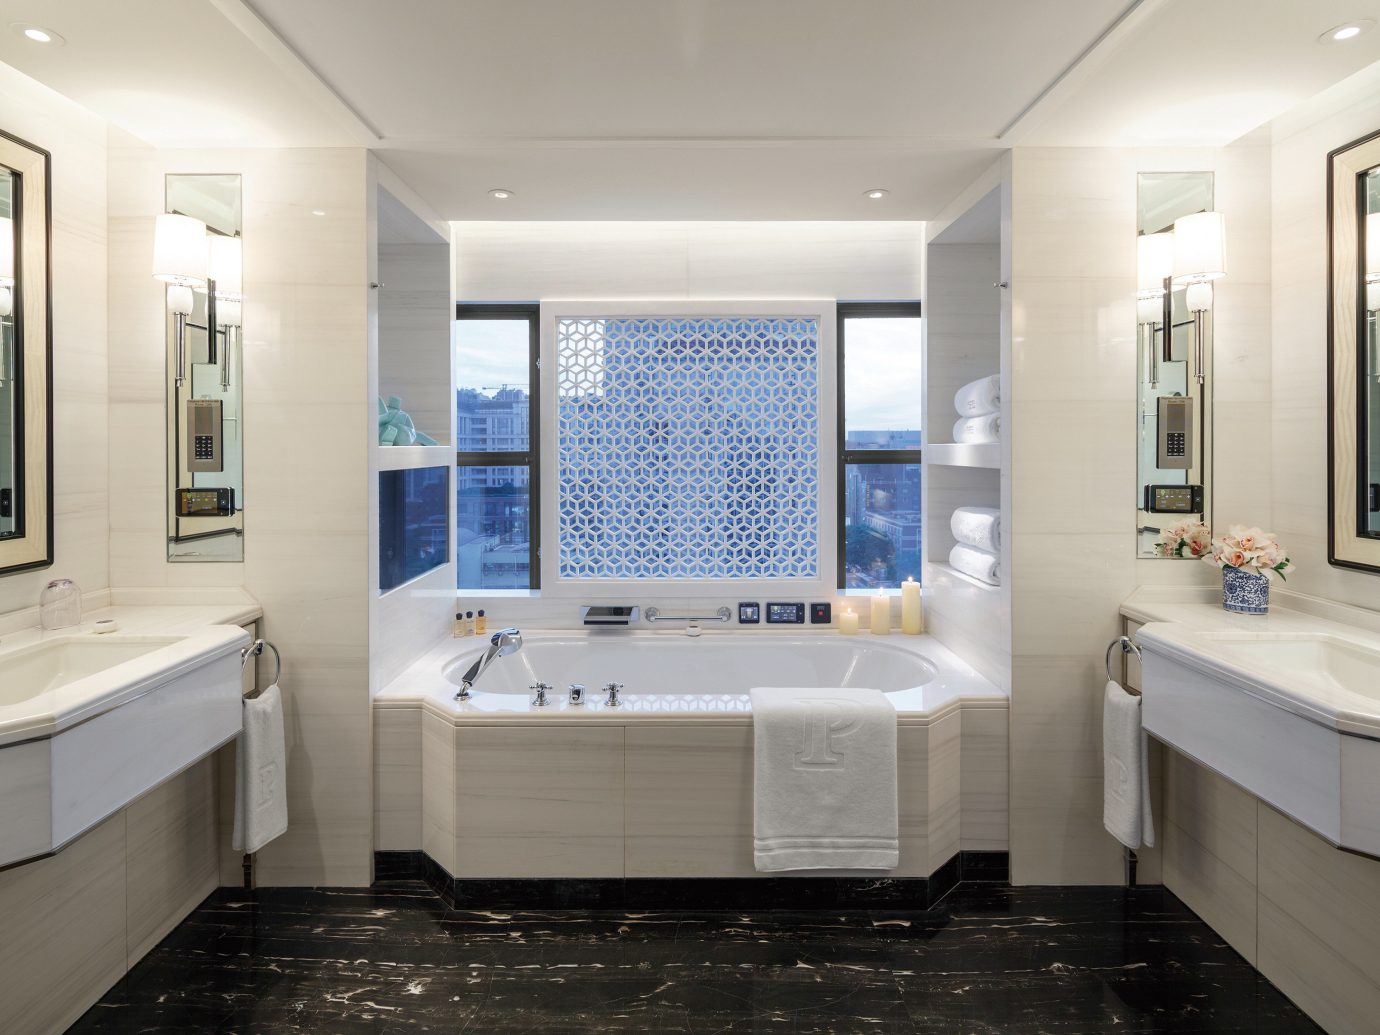 Trip Ideas indoor floor wall ceiling bathroom window room property sink home estate interior design real estate bathtub tub Design Suite plumbing fixture apartment tile Bath Modern tiled